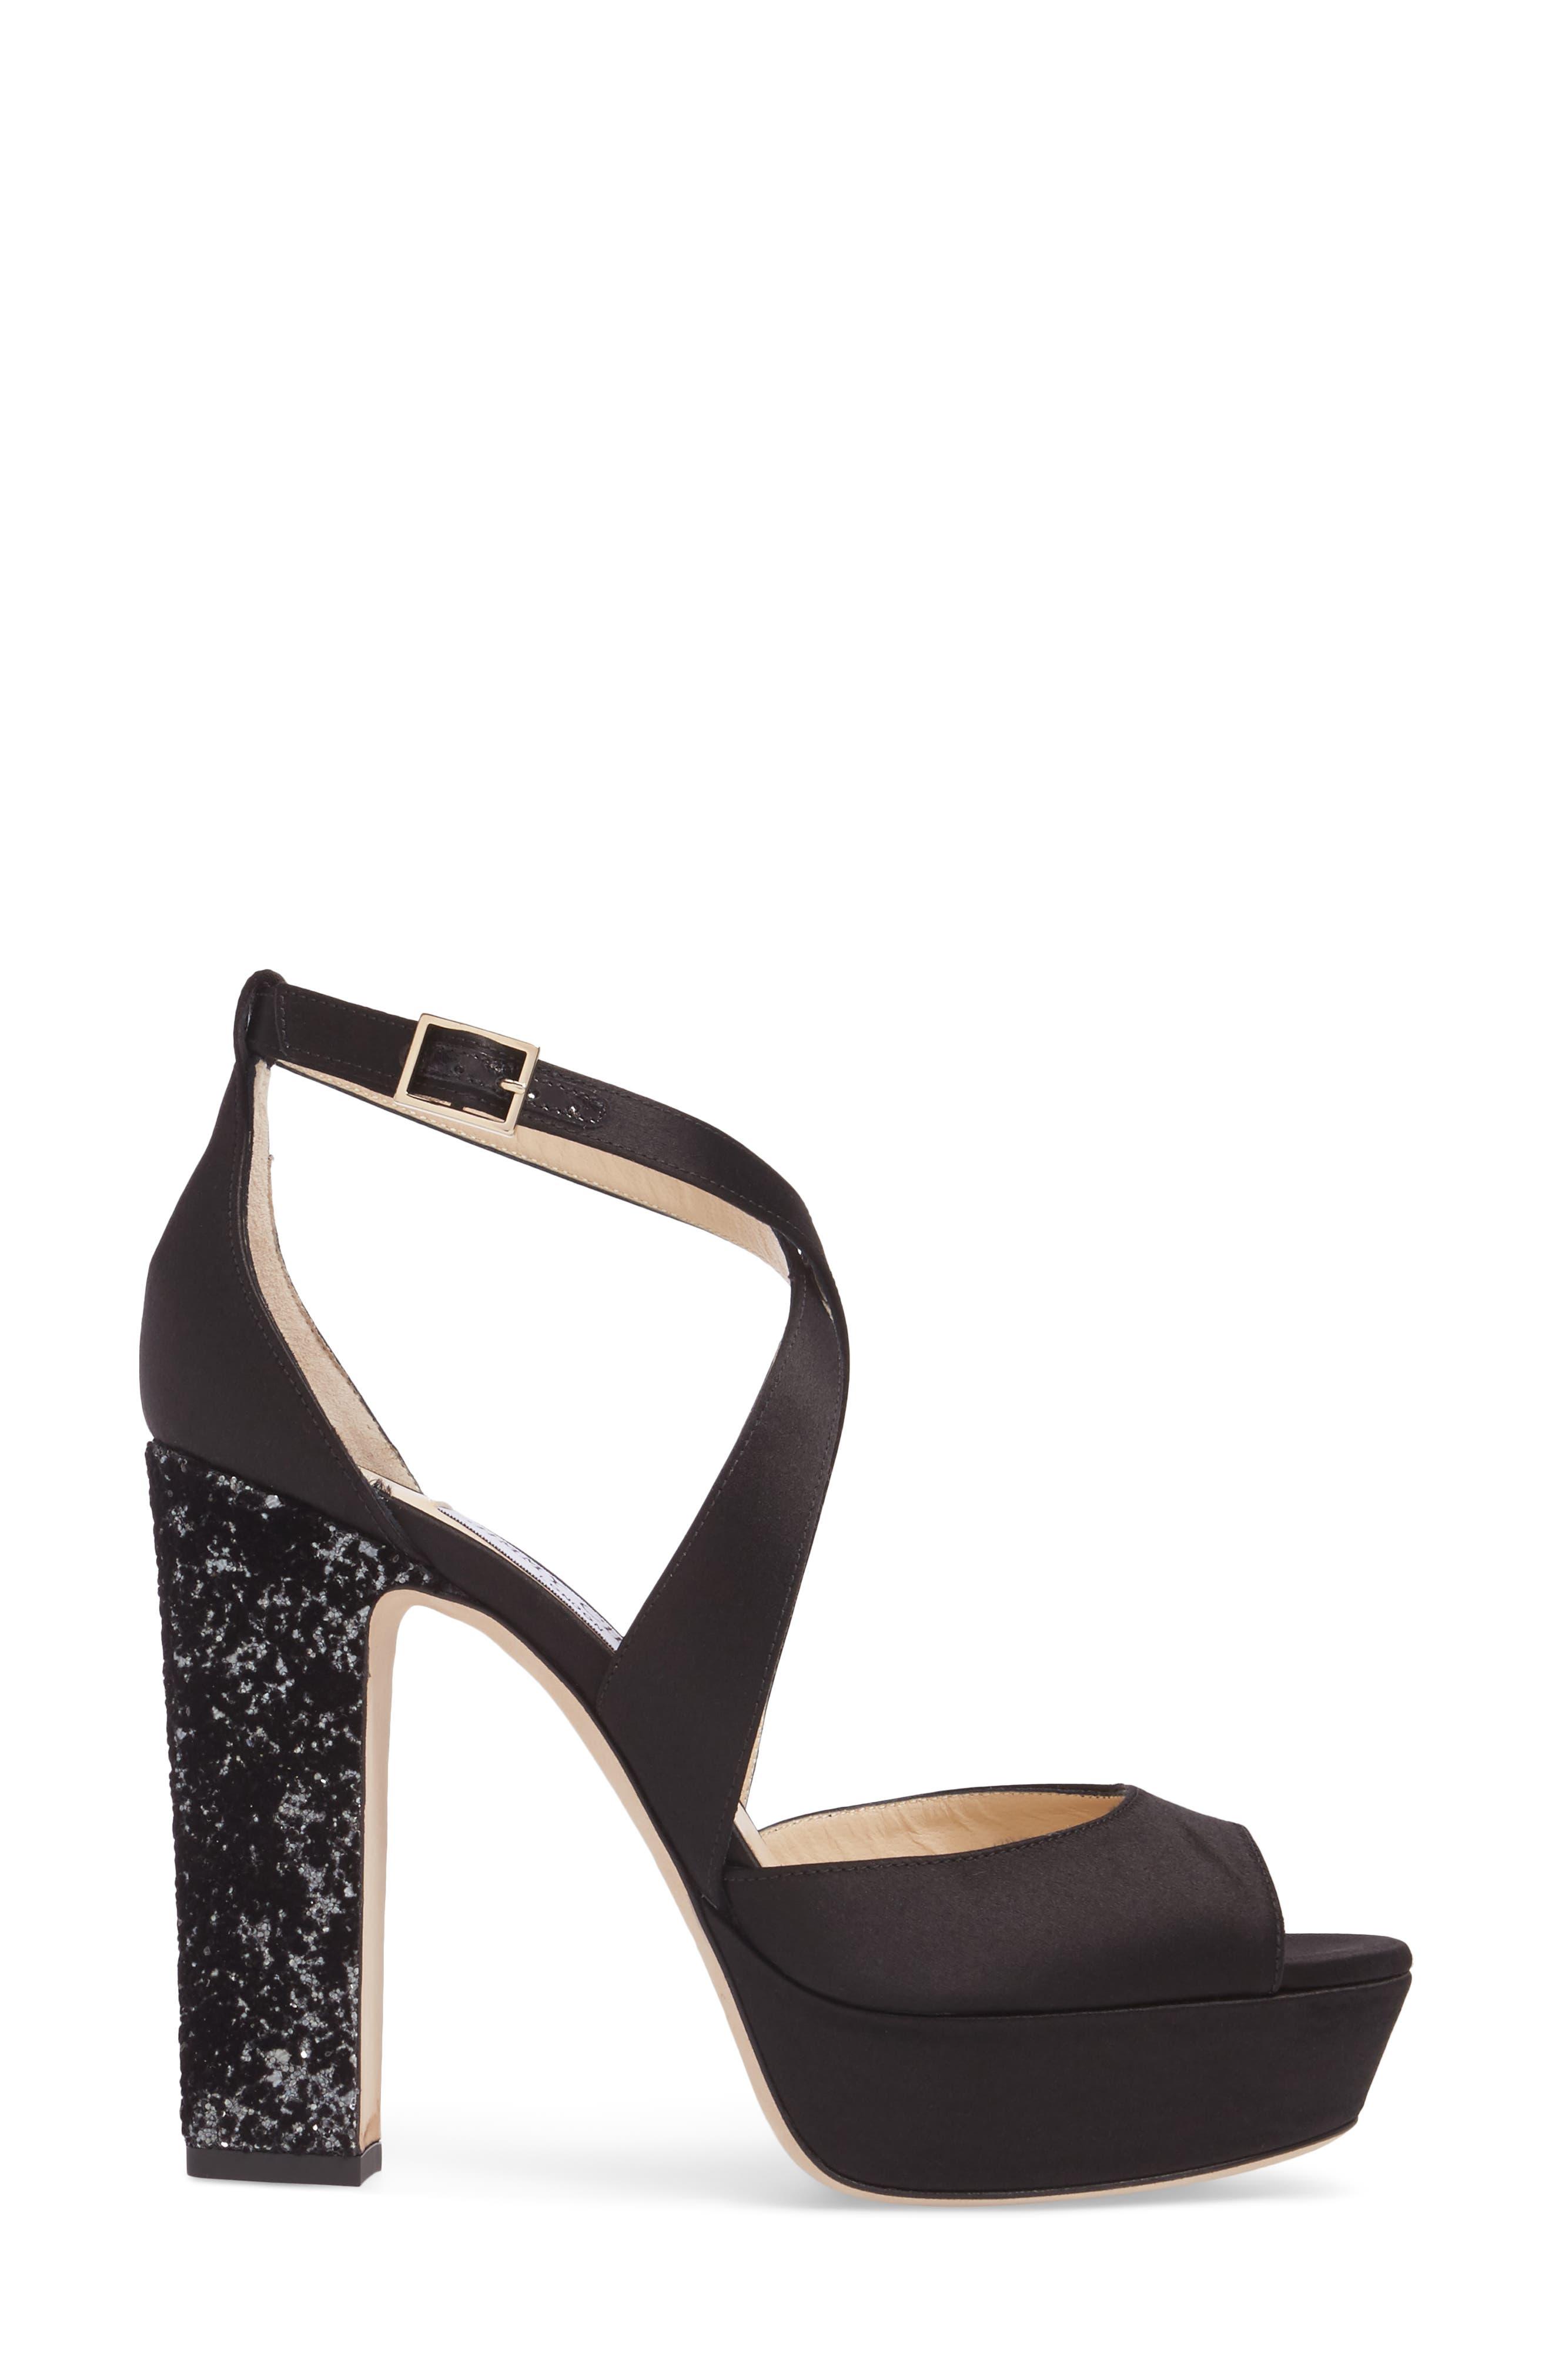 April Platform Sandal,                             Alternate thumbnail 3, color,                             Black/ Anthracite/ Black